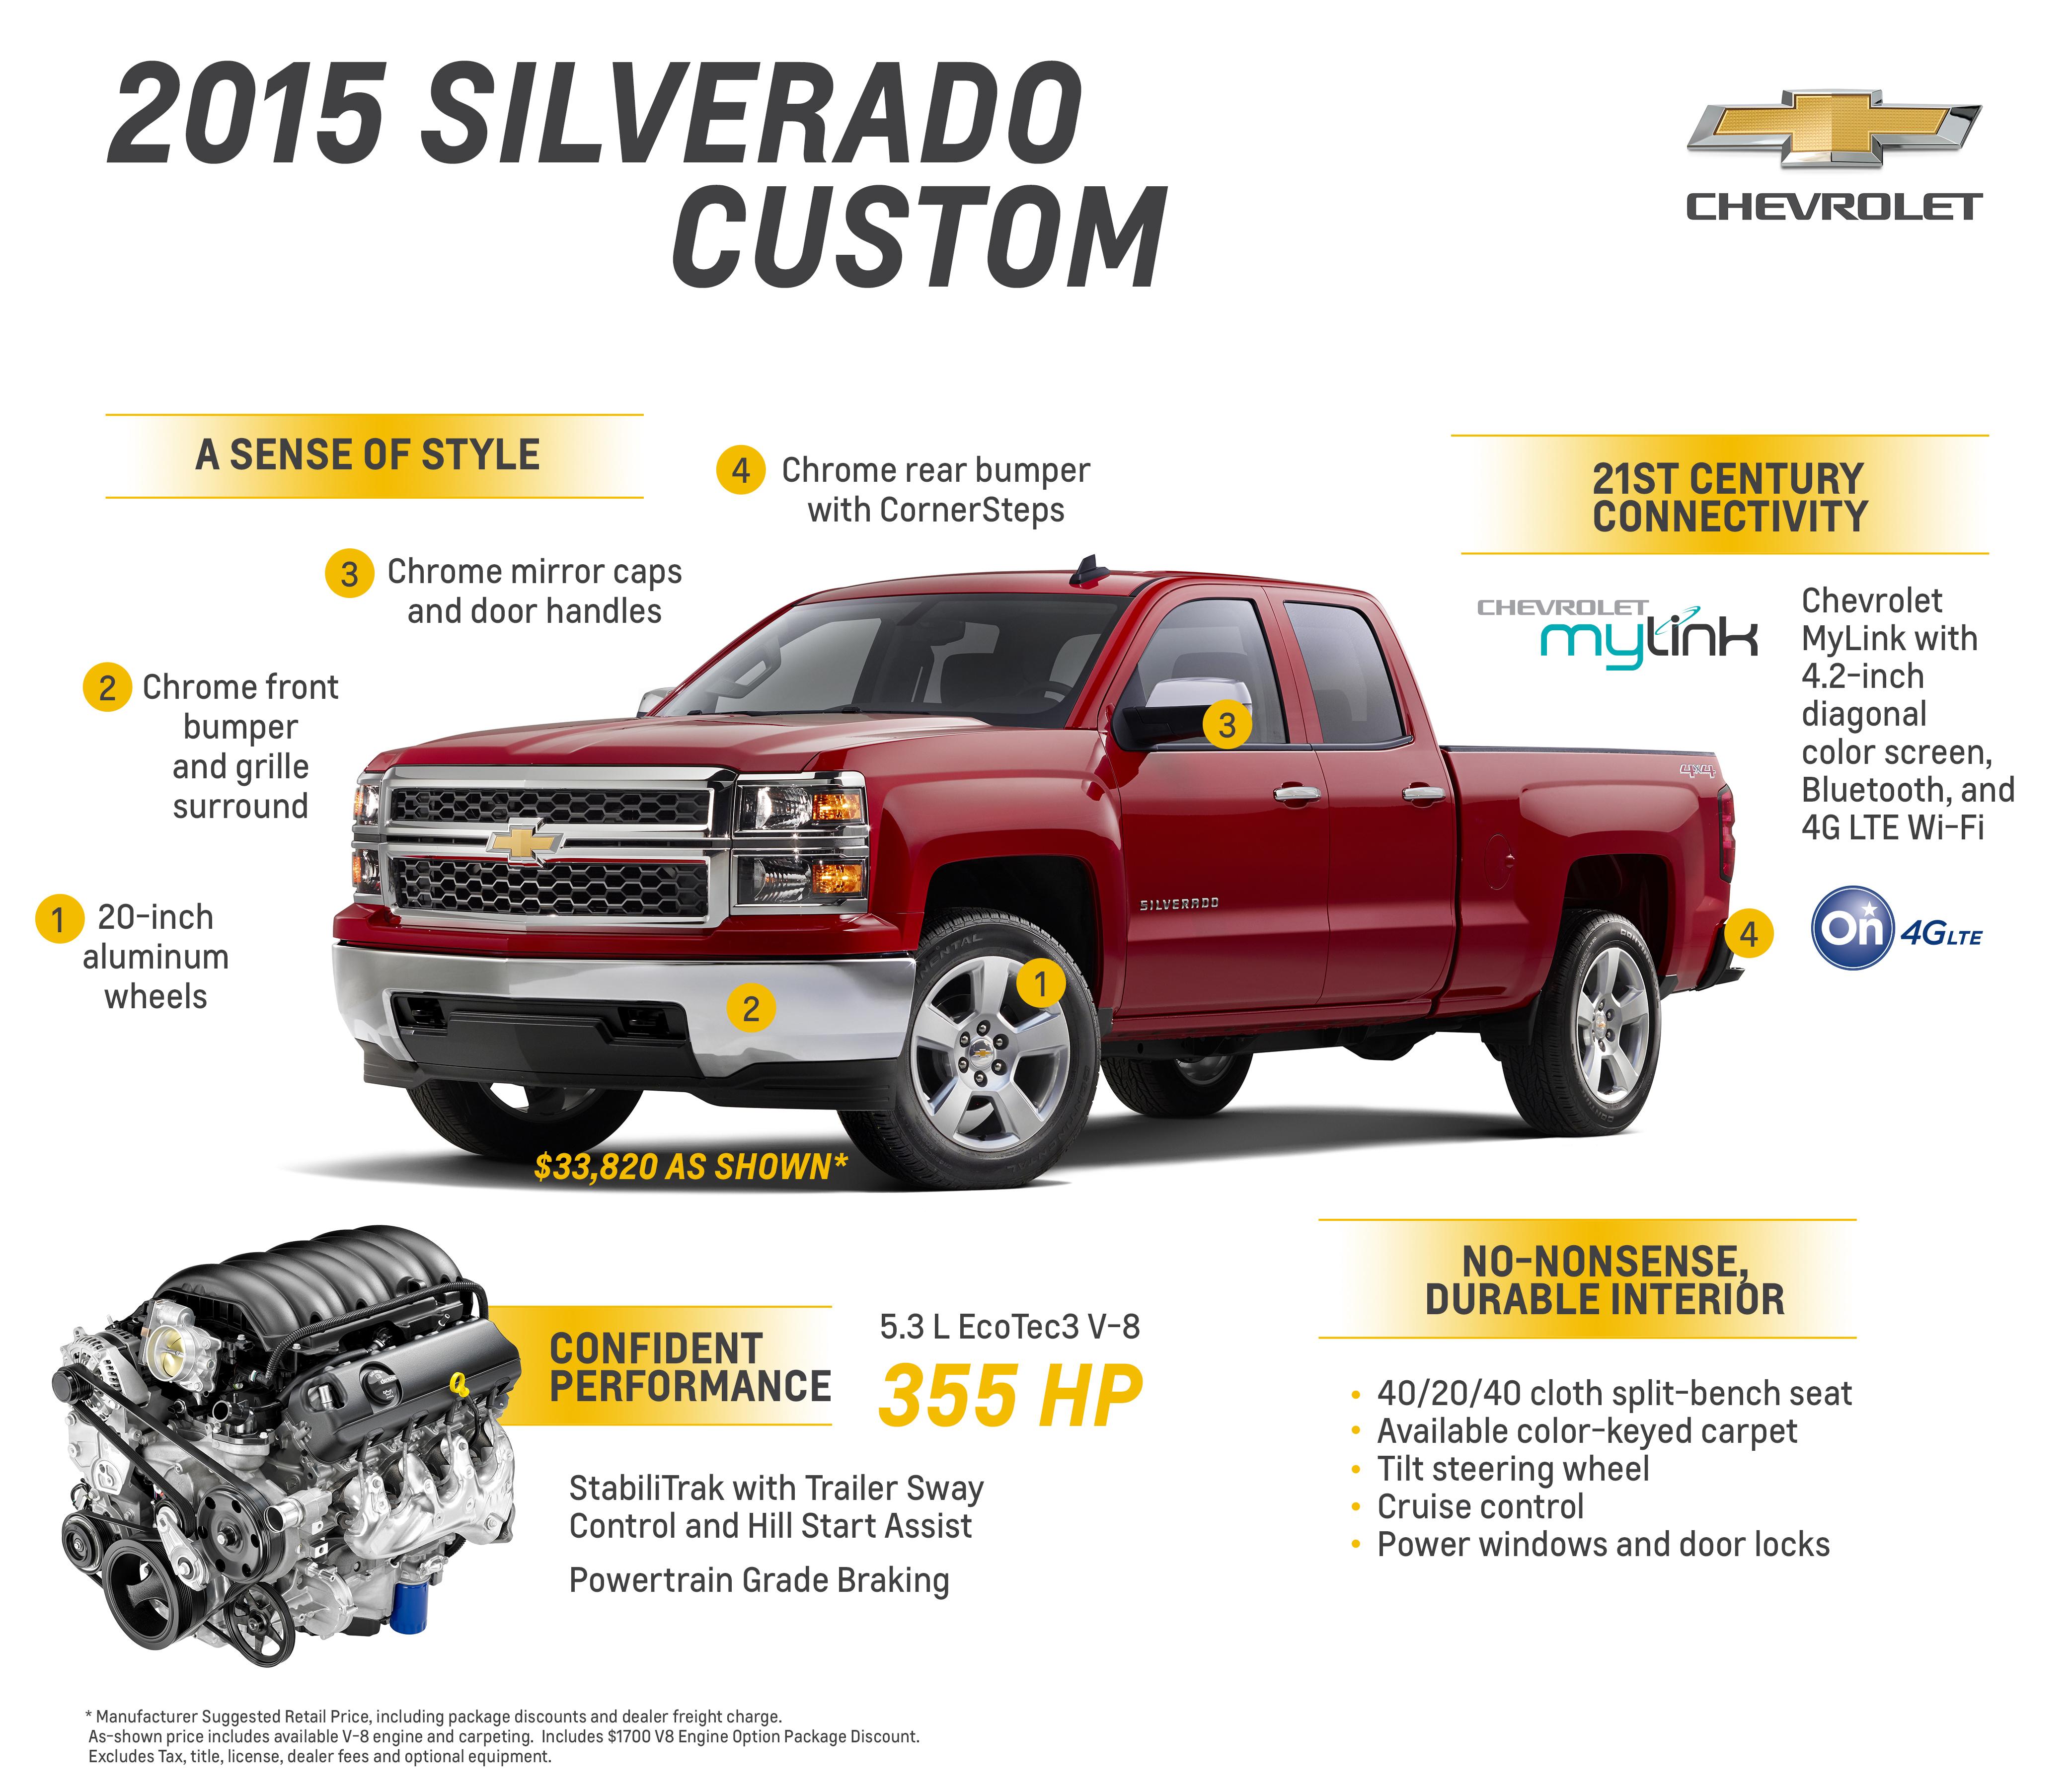 2015 Silverado Custom Back To Basics With Style